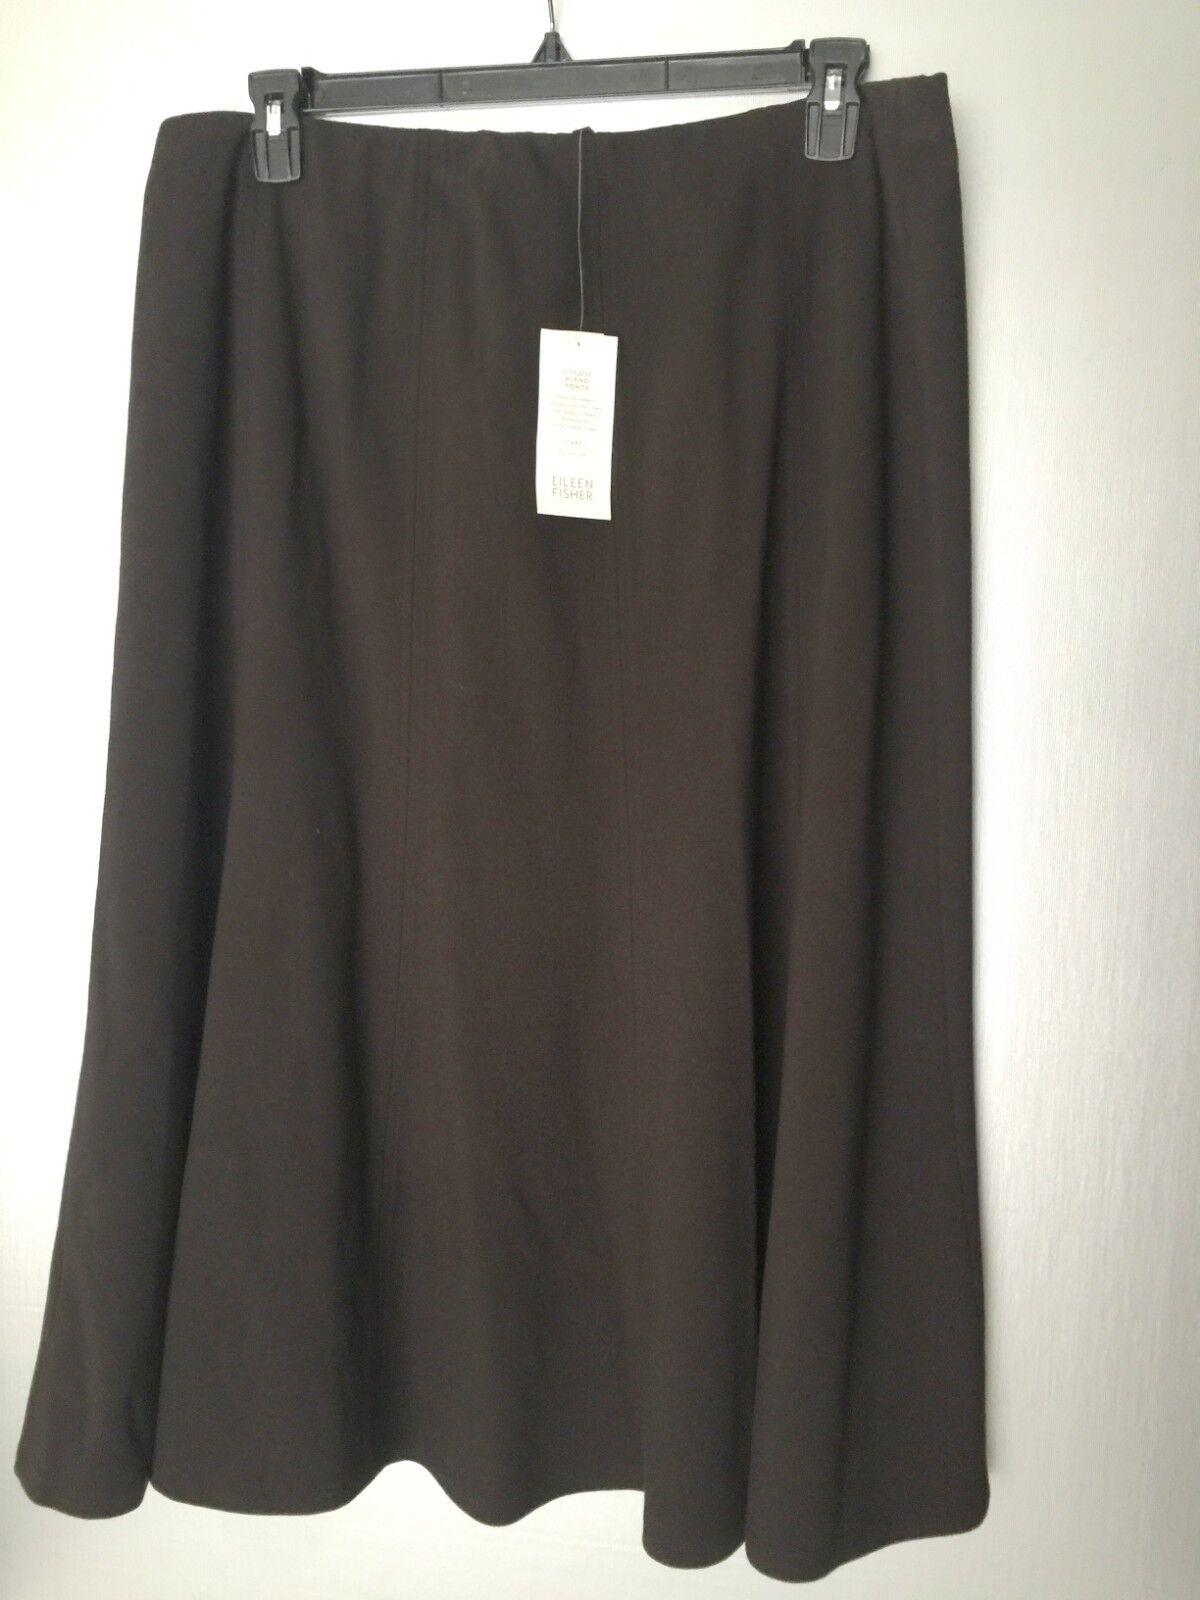 Eileen Fisher Chocolate Brown Viscose Blend Ponte Gored Paneled Skirt XL